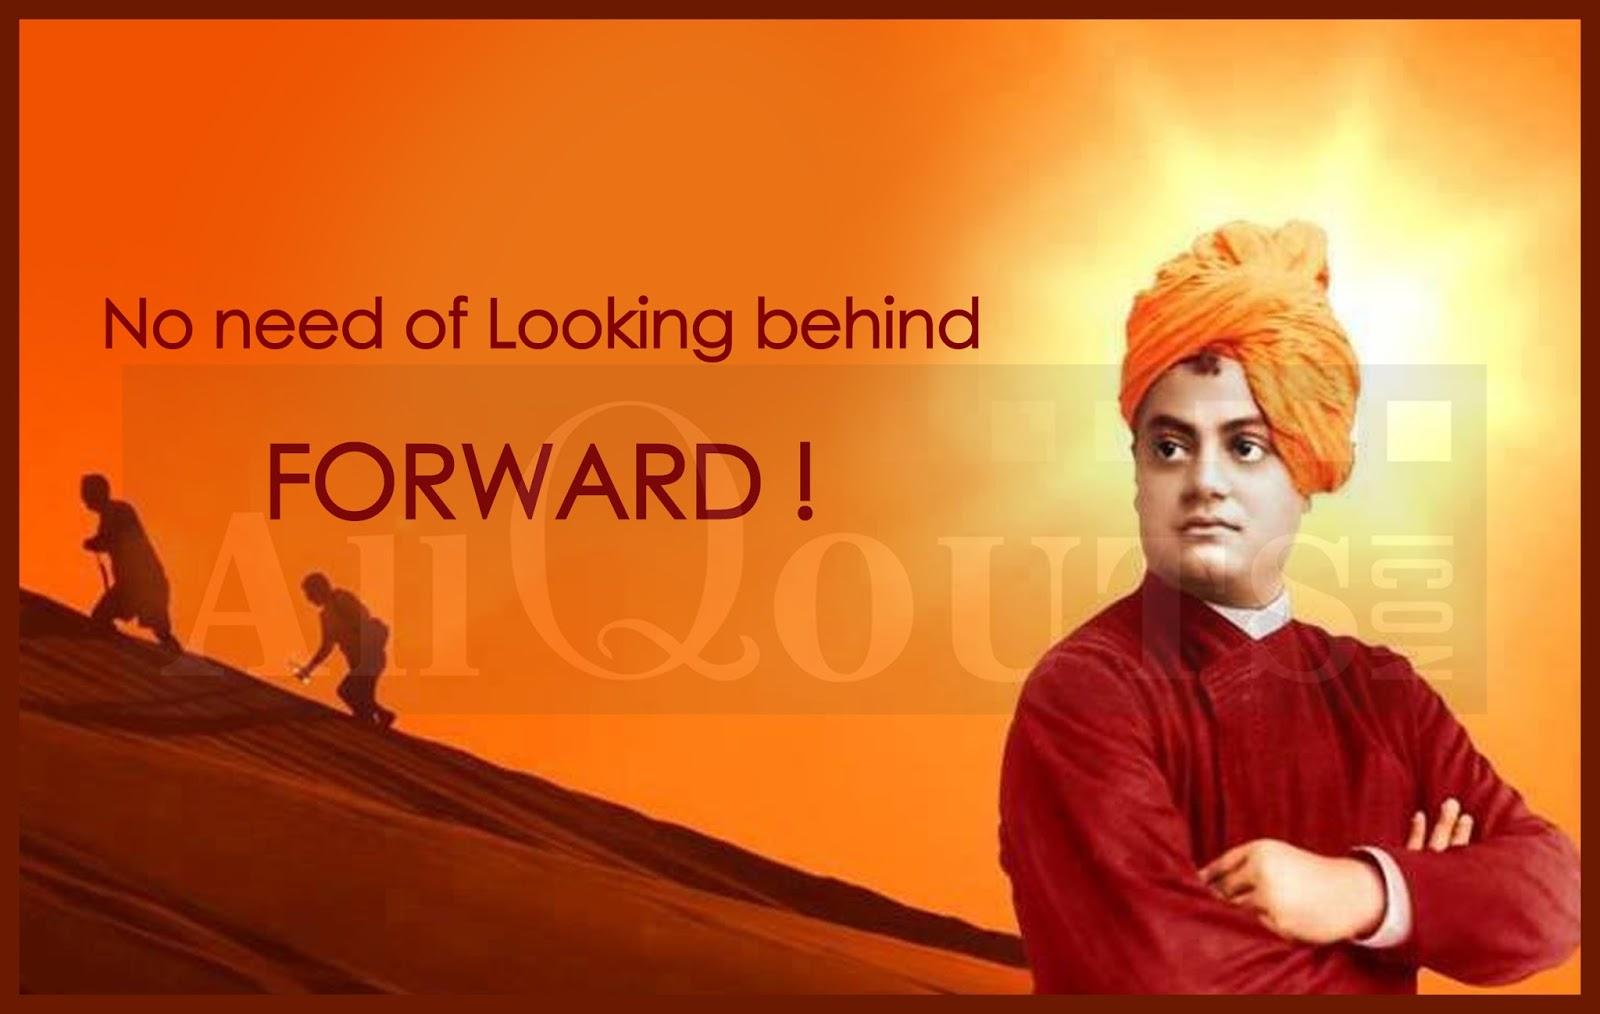 Swami Vivekananda Wallpapers Mobile auto kfzinfo 1600x1014